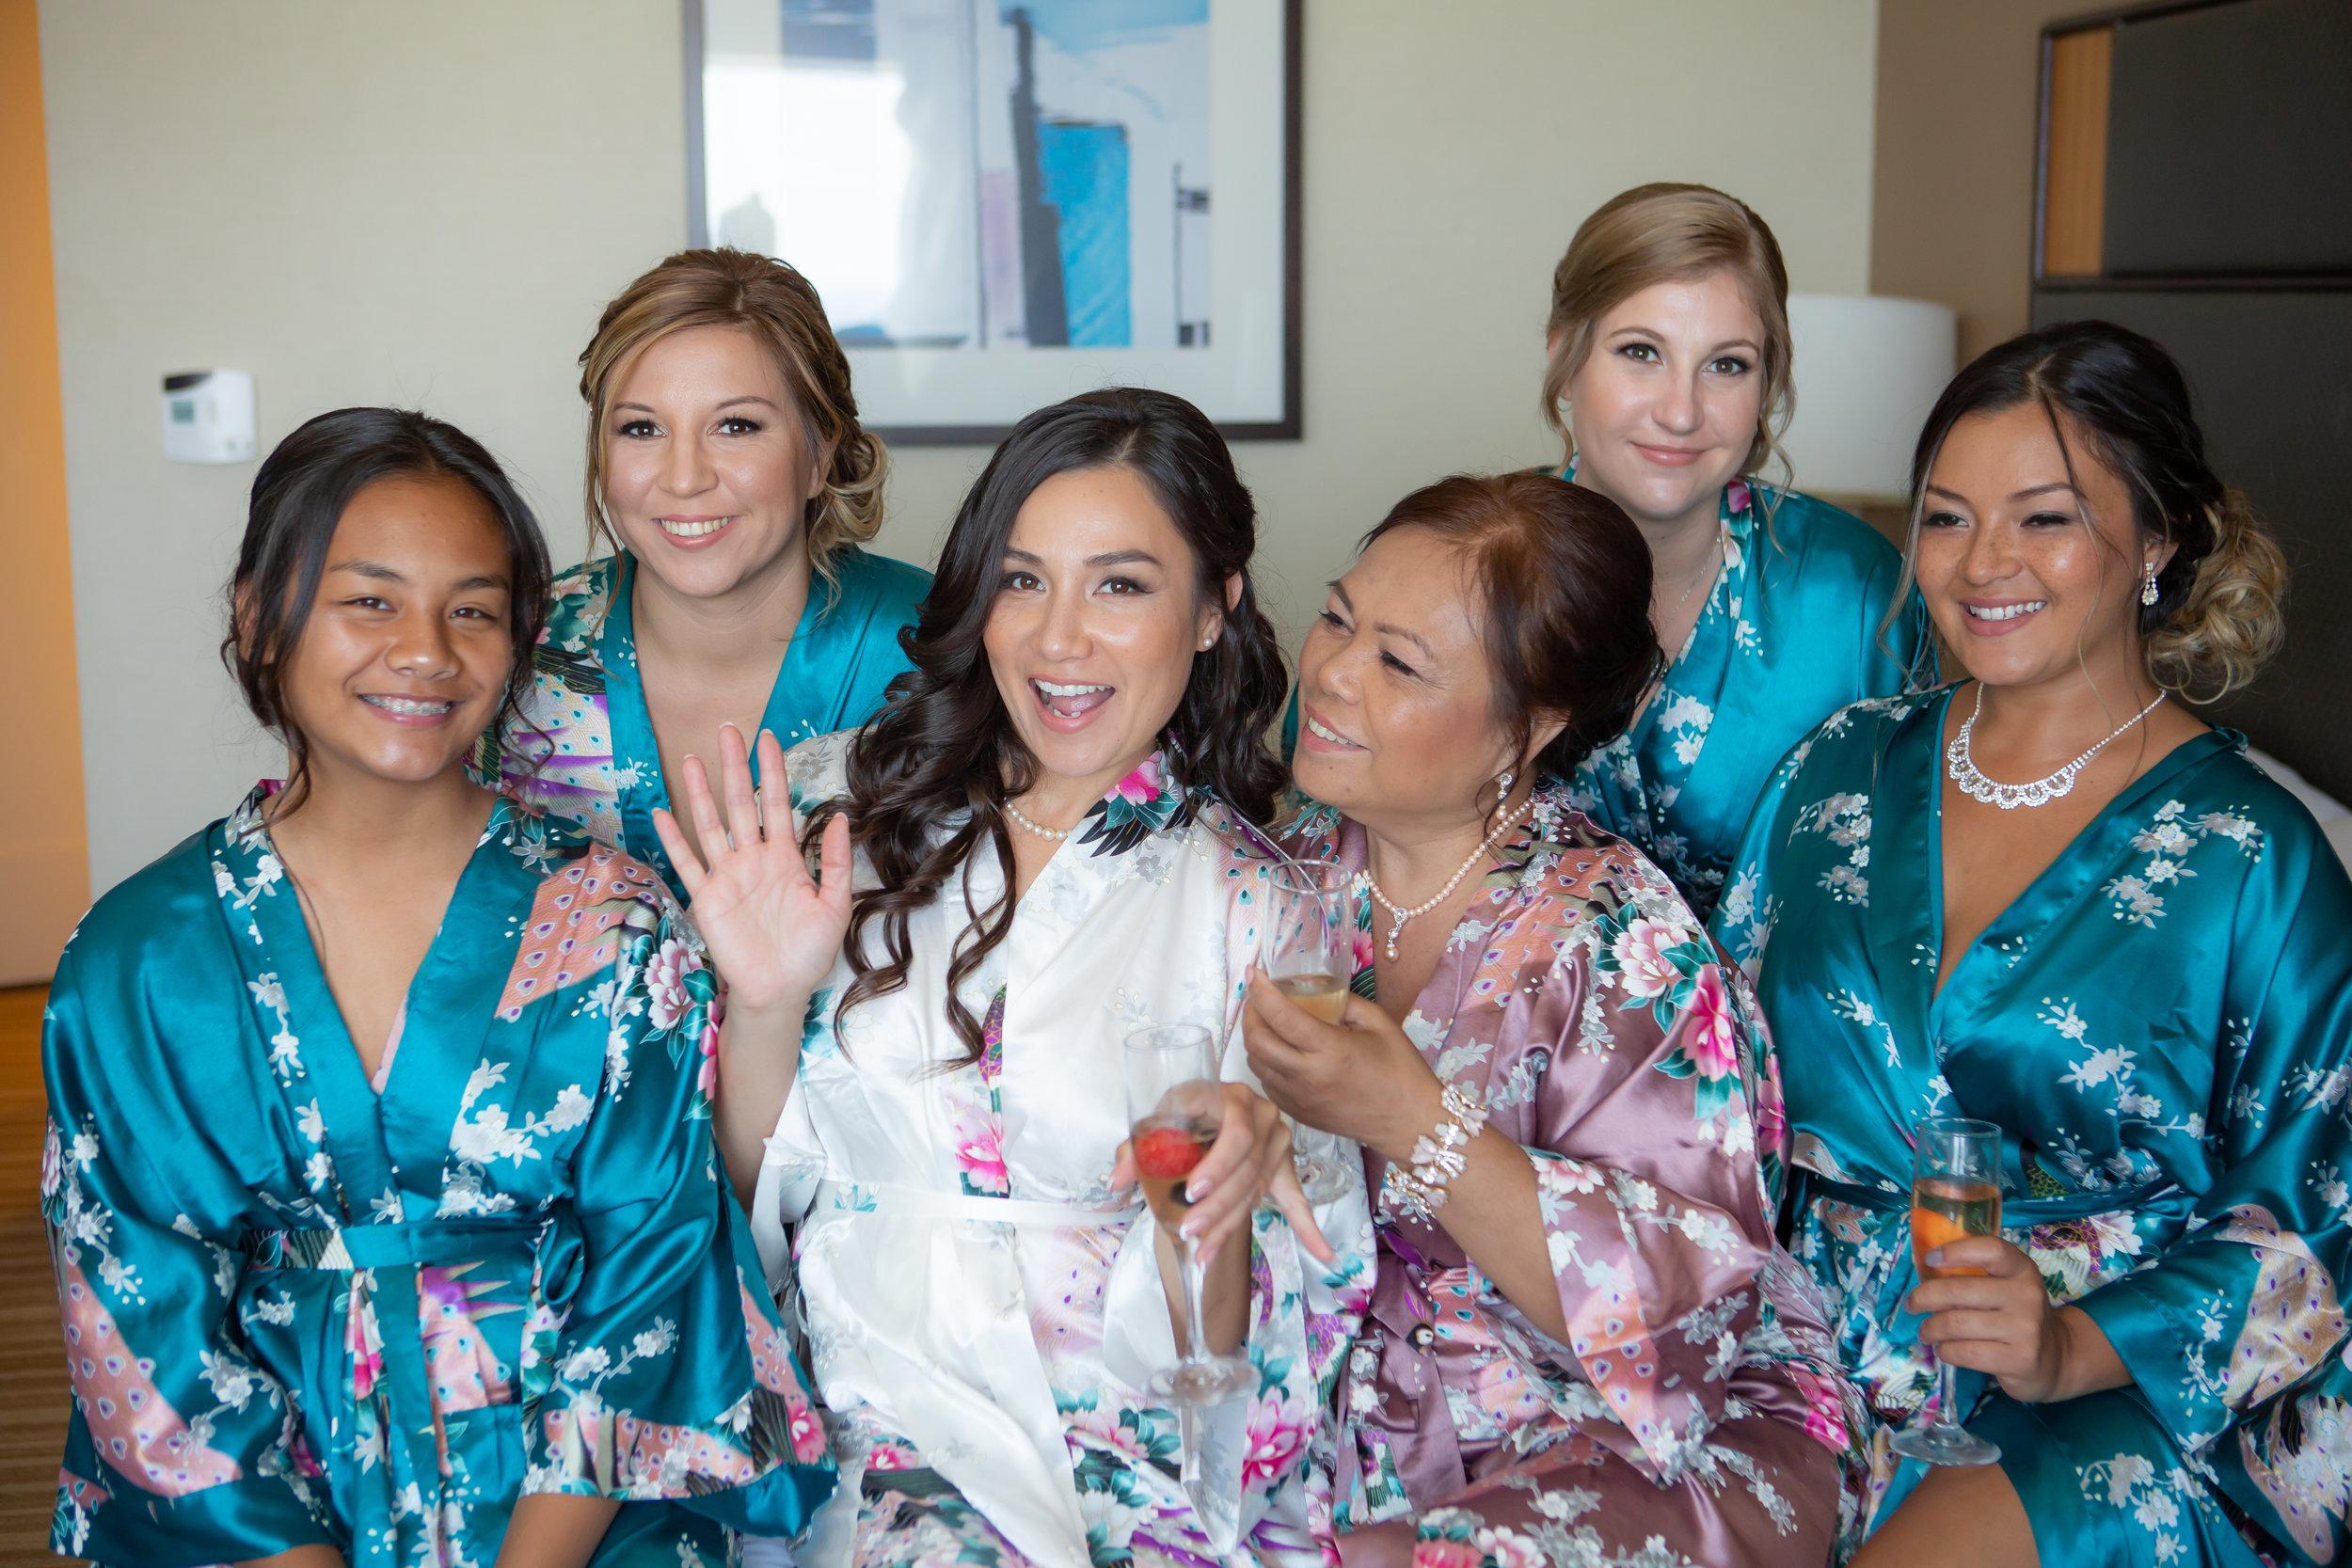 San-Diego-Wedding-Japanese-Friendship-Garden-Carla-David-2018-21.jpg